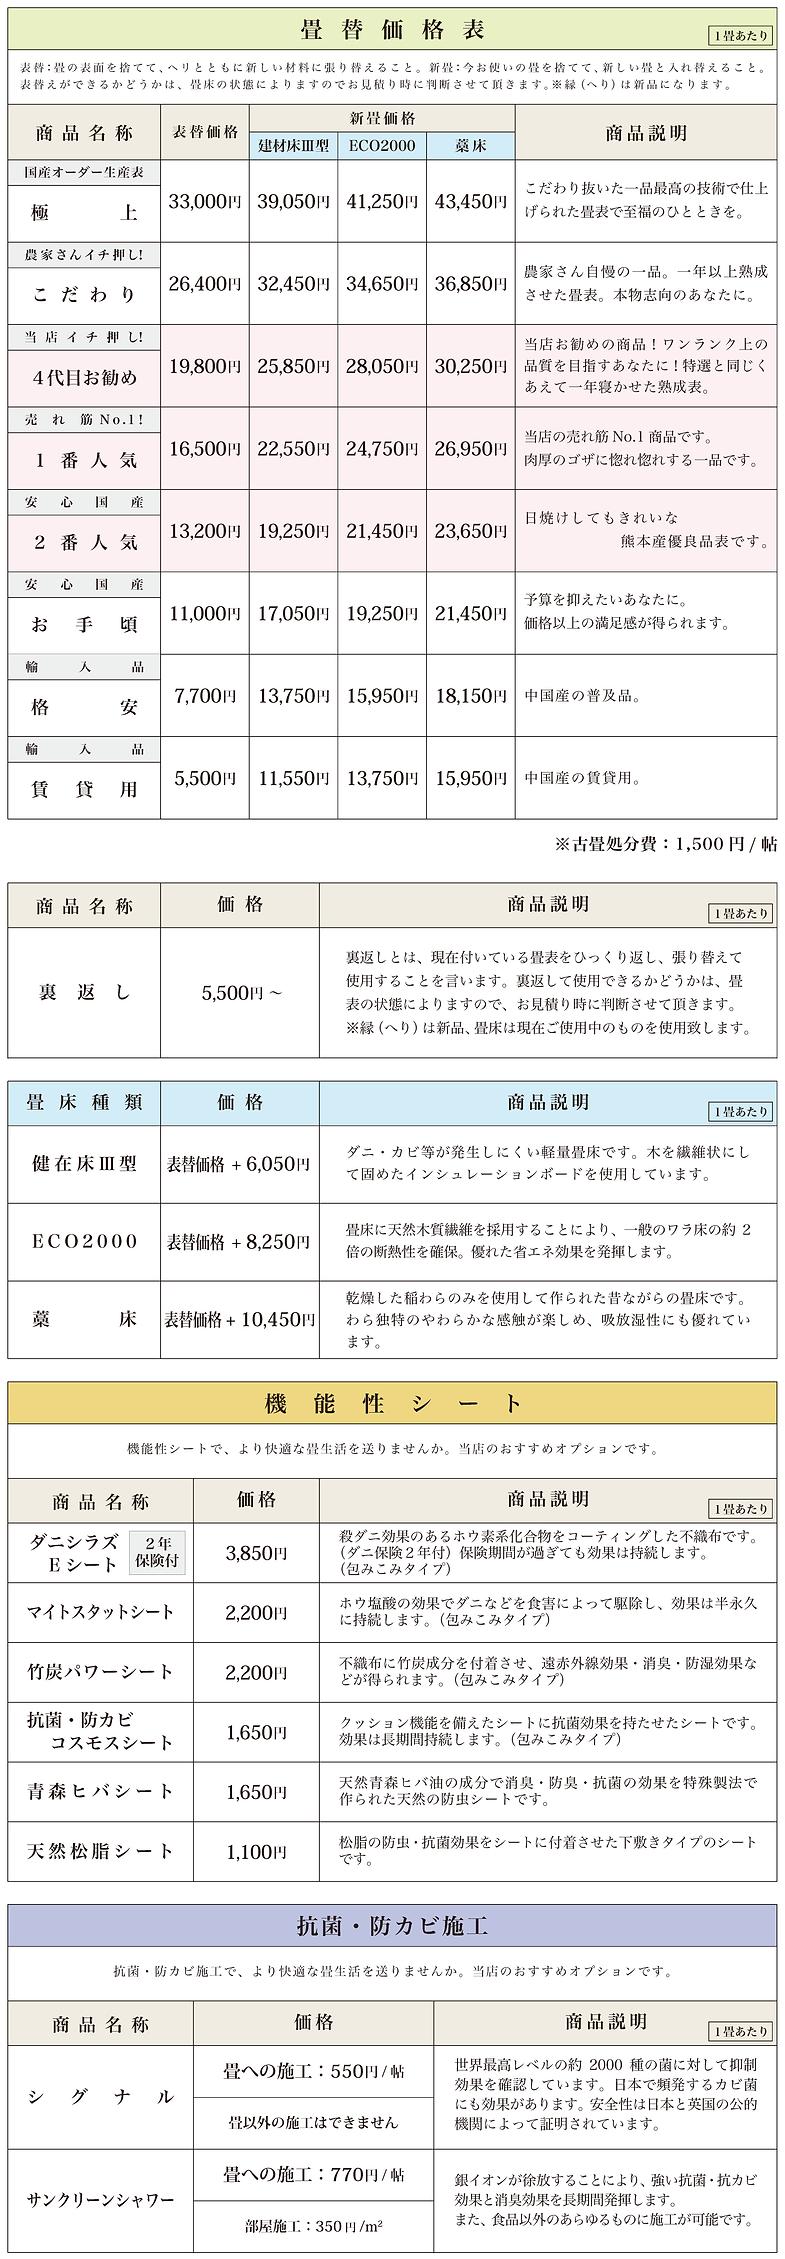 三重県亀山市,大平畳製造所,畳屋,畳店,価格,料金,畳替え,畳リフォーム